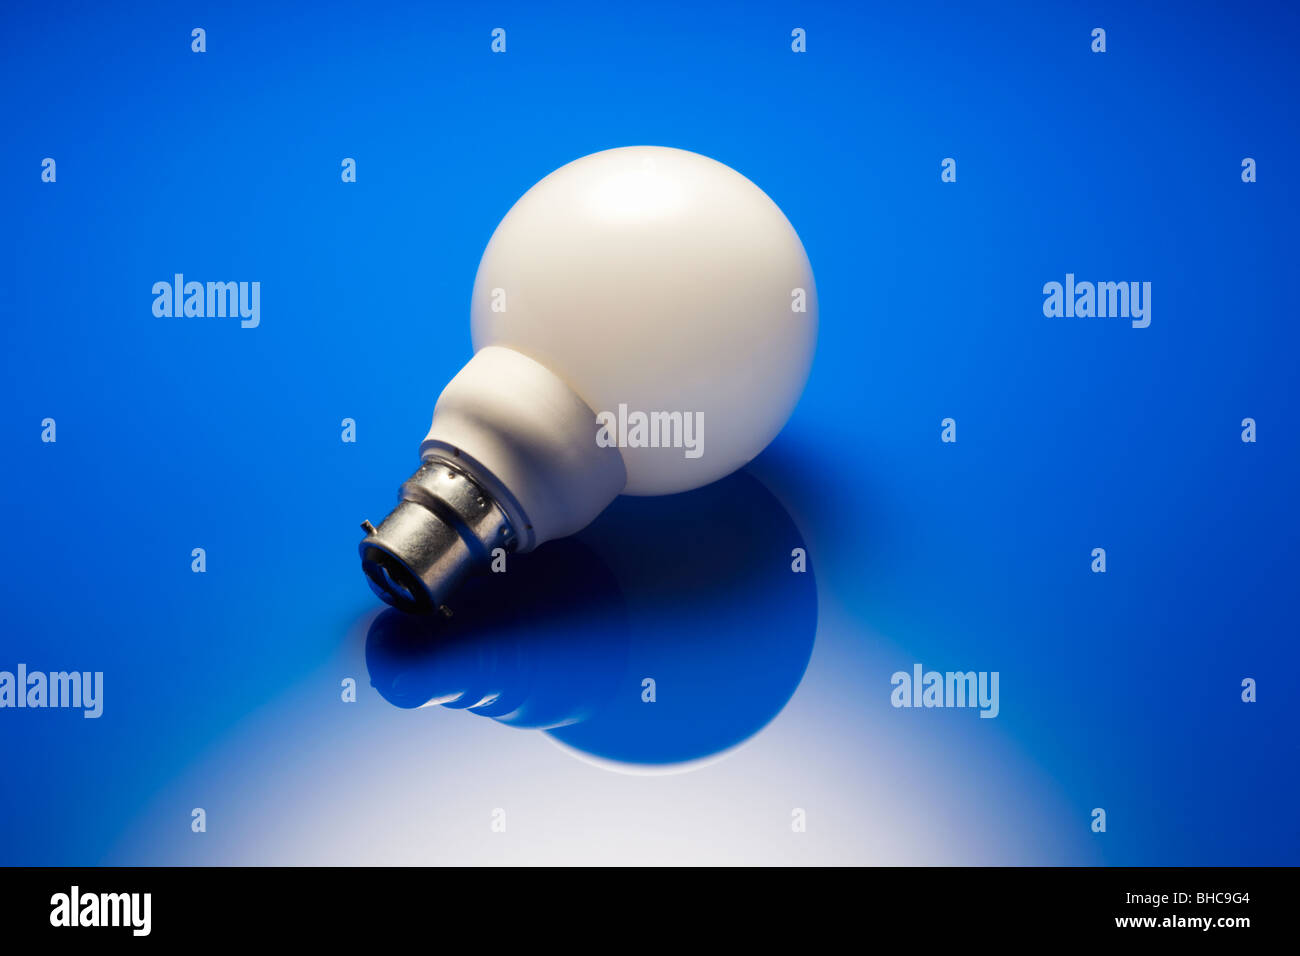 Risparmio energetico lampada Immagini Stock